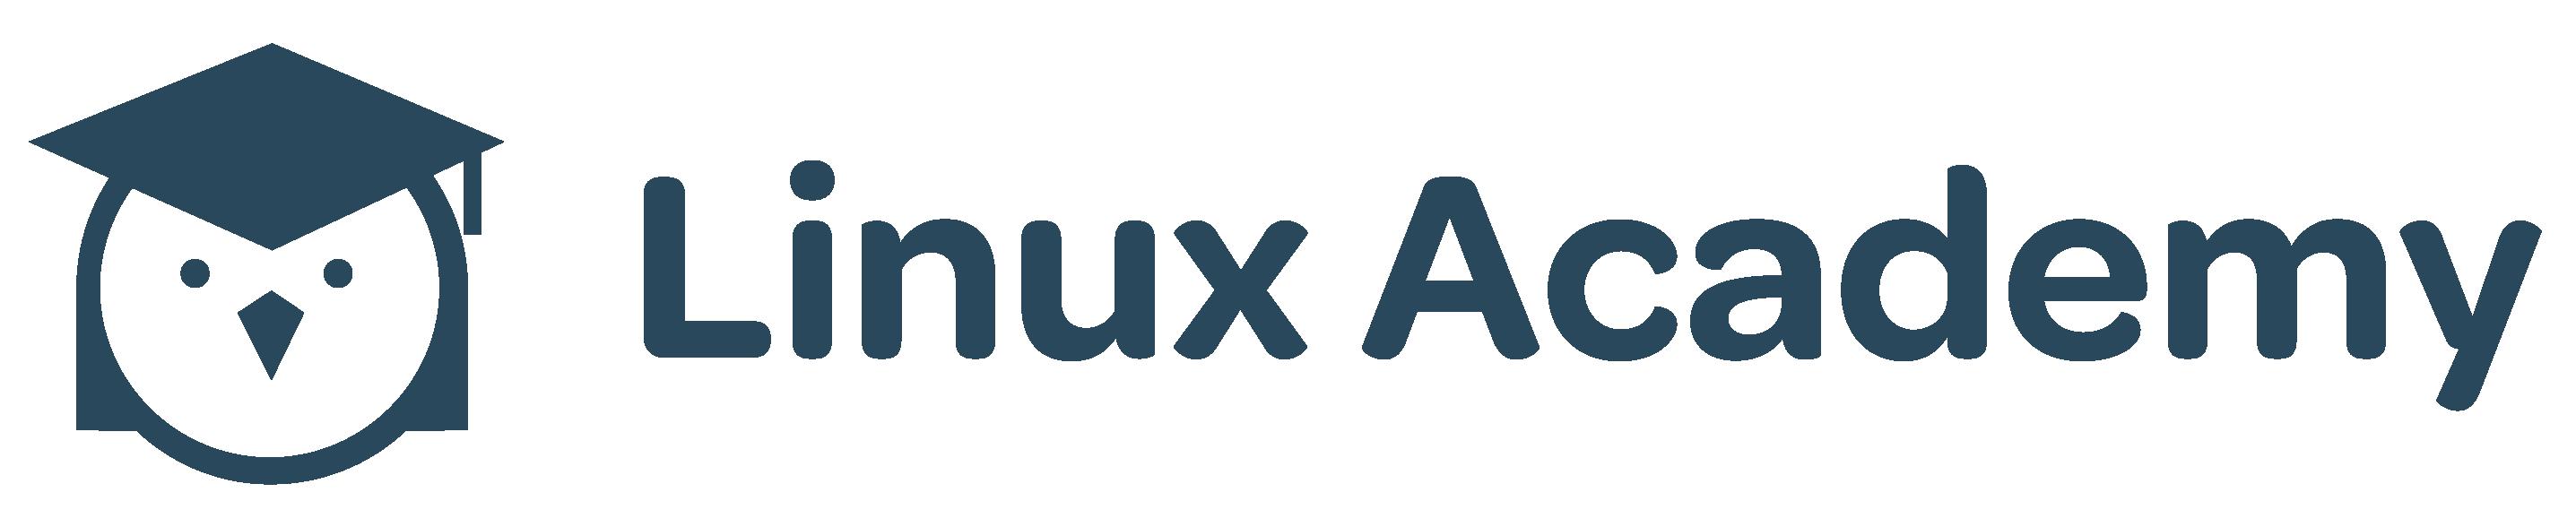 Linux Academy logo